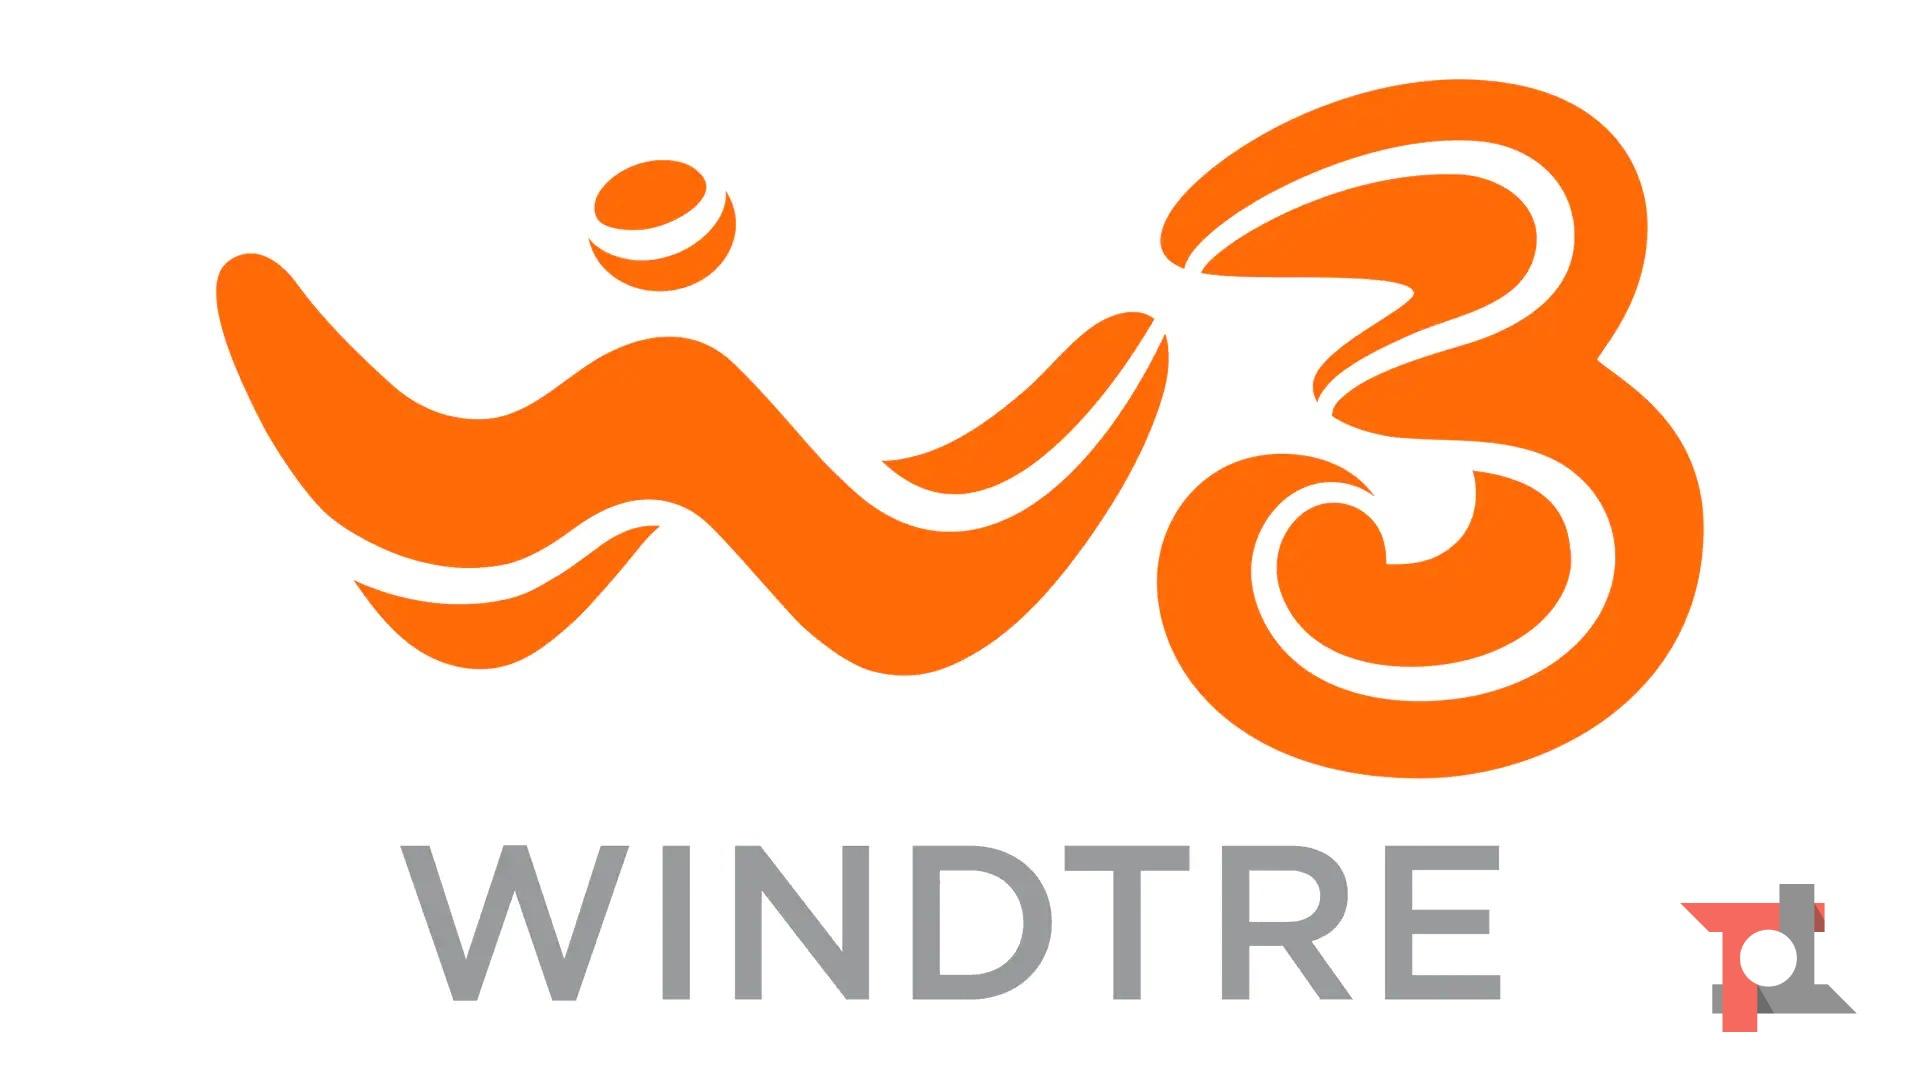 Migliori offerte fibra e ADSL di TIM, Vodafone, Fastweb, WINDTRE e Tiscali 4